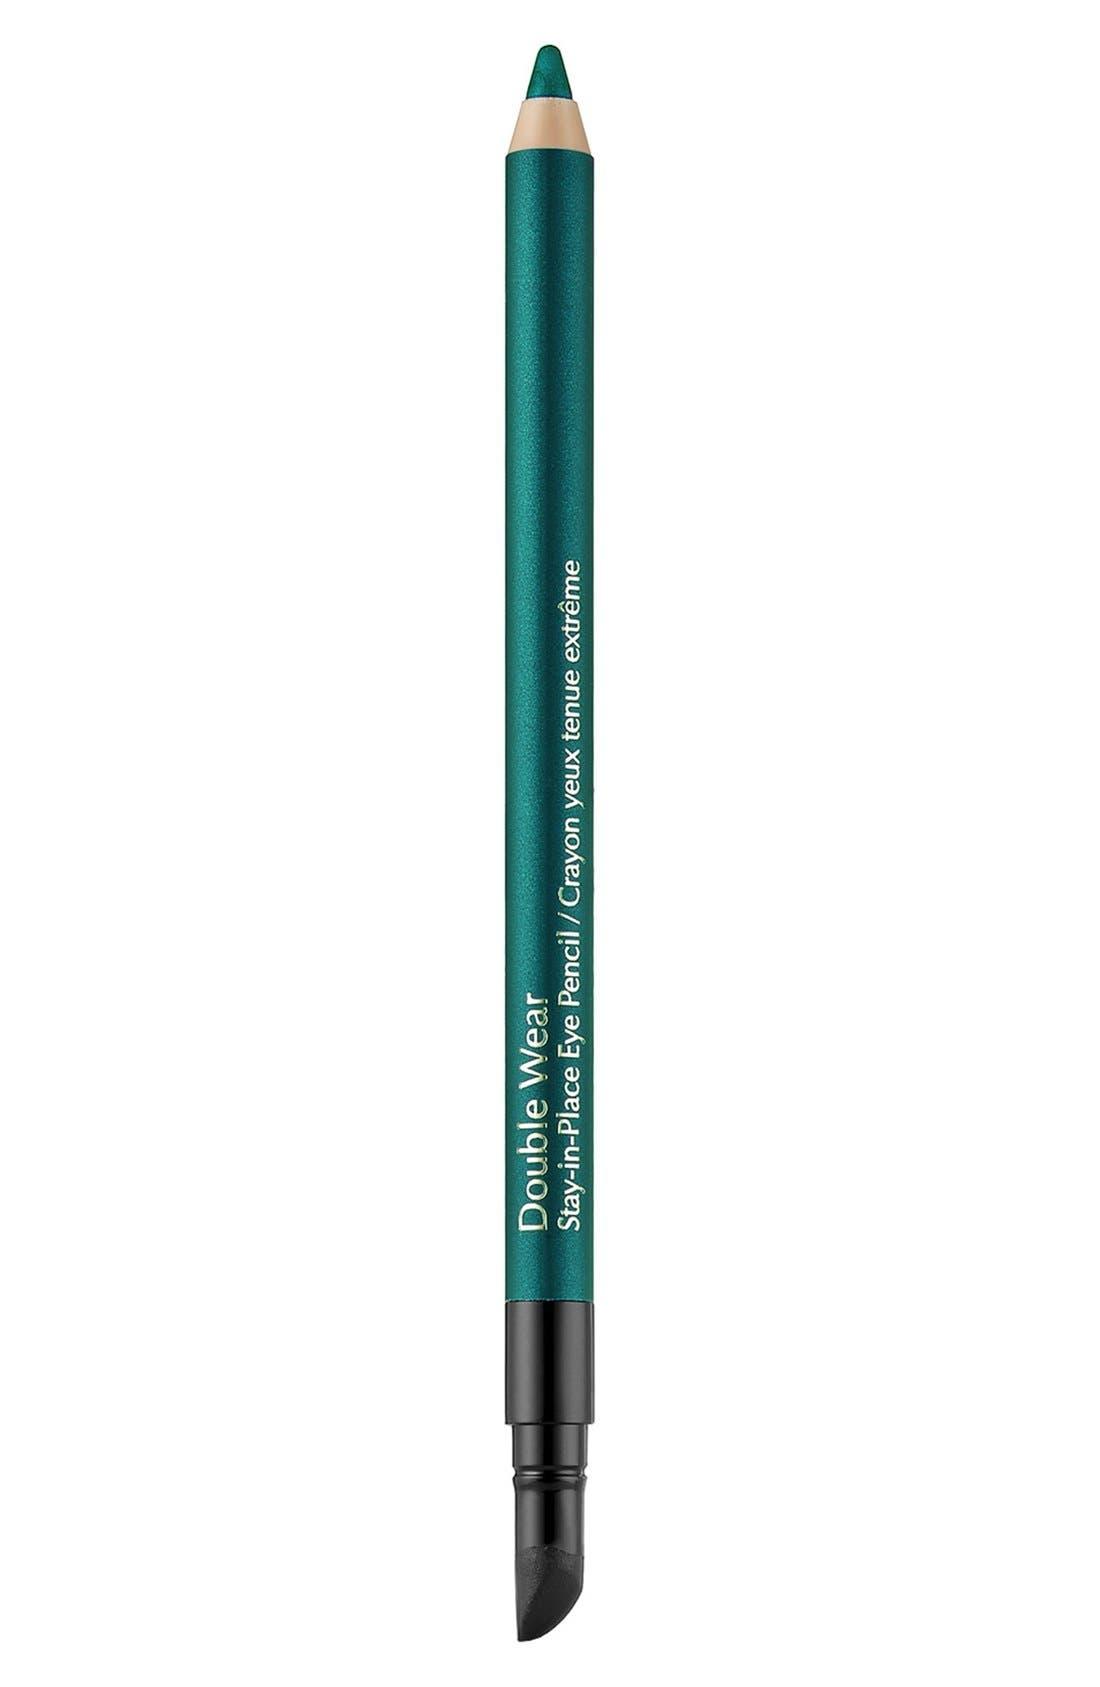 Estee Lauder Double Wear Stay-In-Place Eye Pencil - Emerald Volt